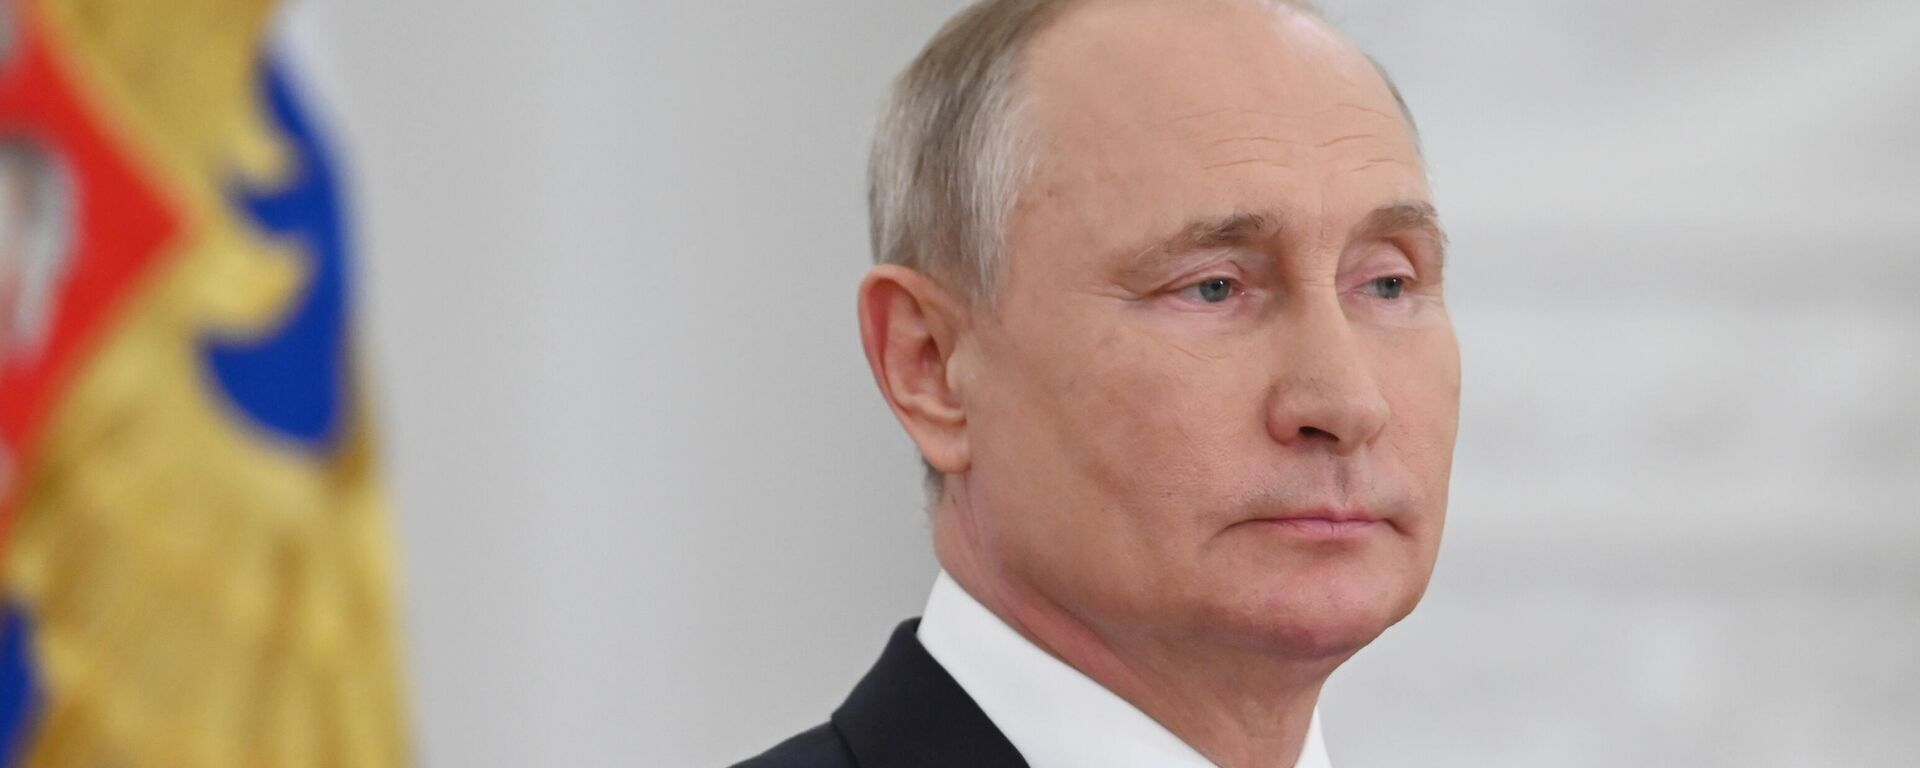 Vladímir Putin, presidente de Rusia - Sputnik Mundo, 1920, 24.08.2021